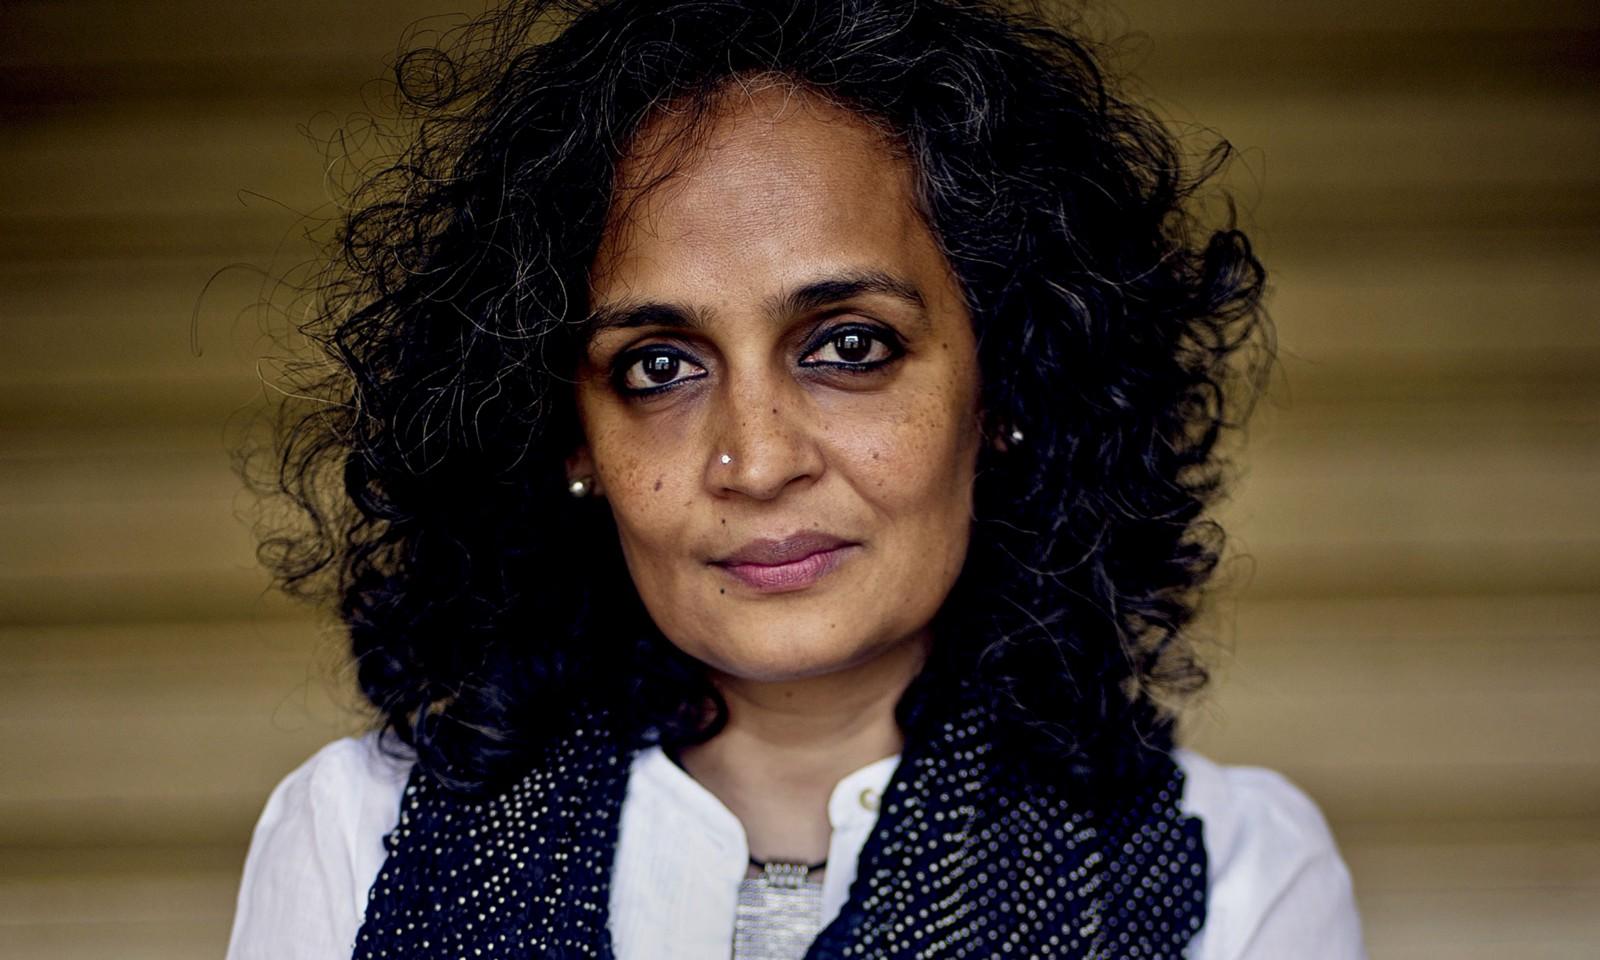 017 Essay Example 1bgfl U471yk4py Wv57now Essays By Arundhati Sensational Roy Full